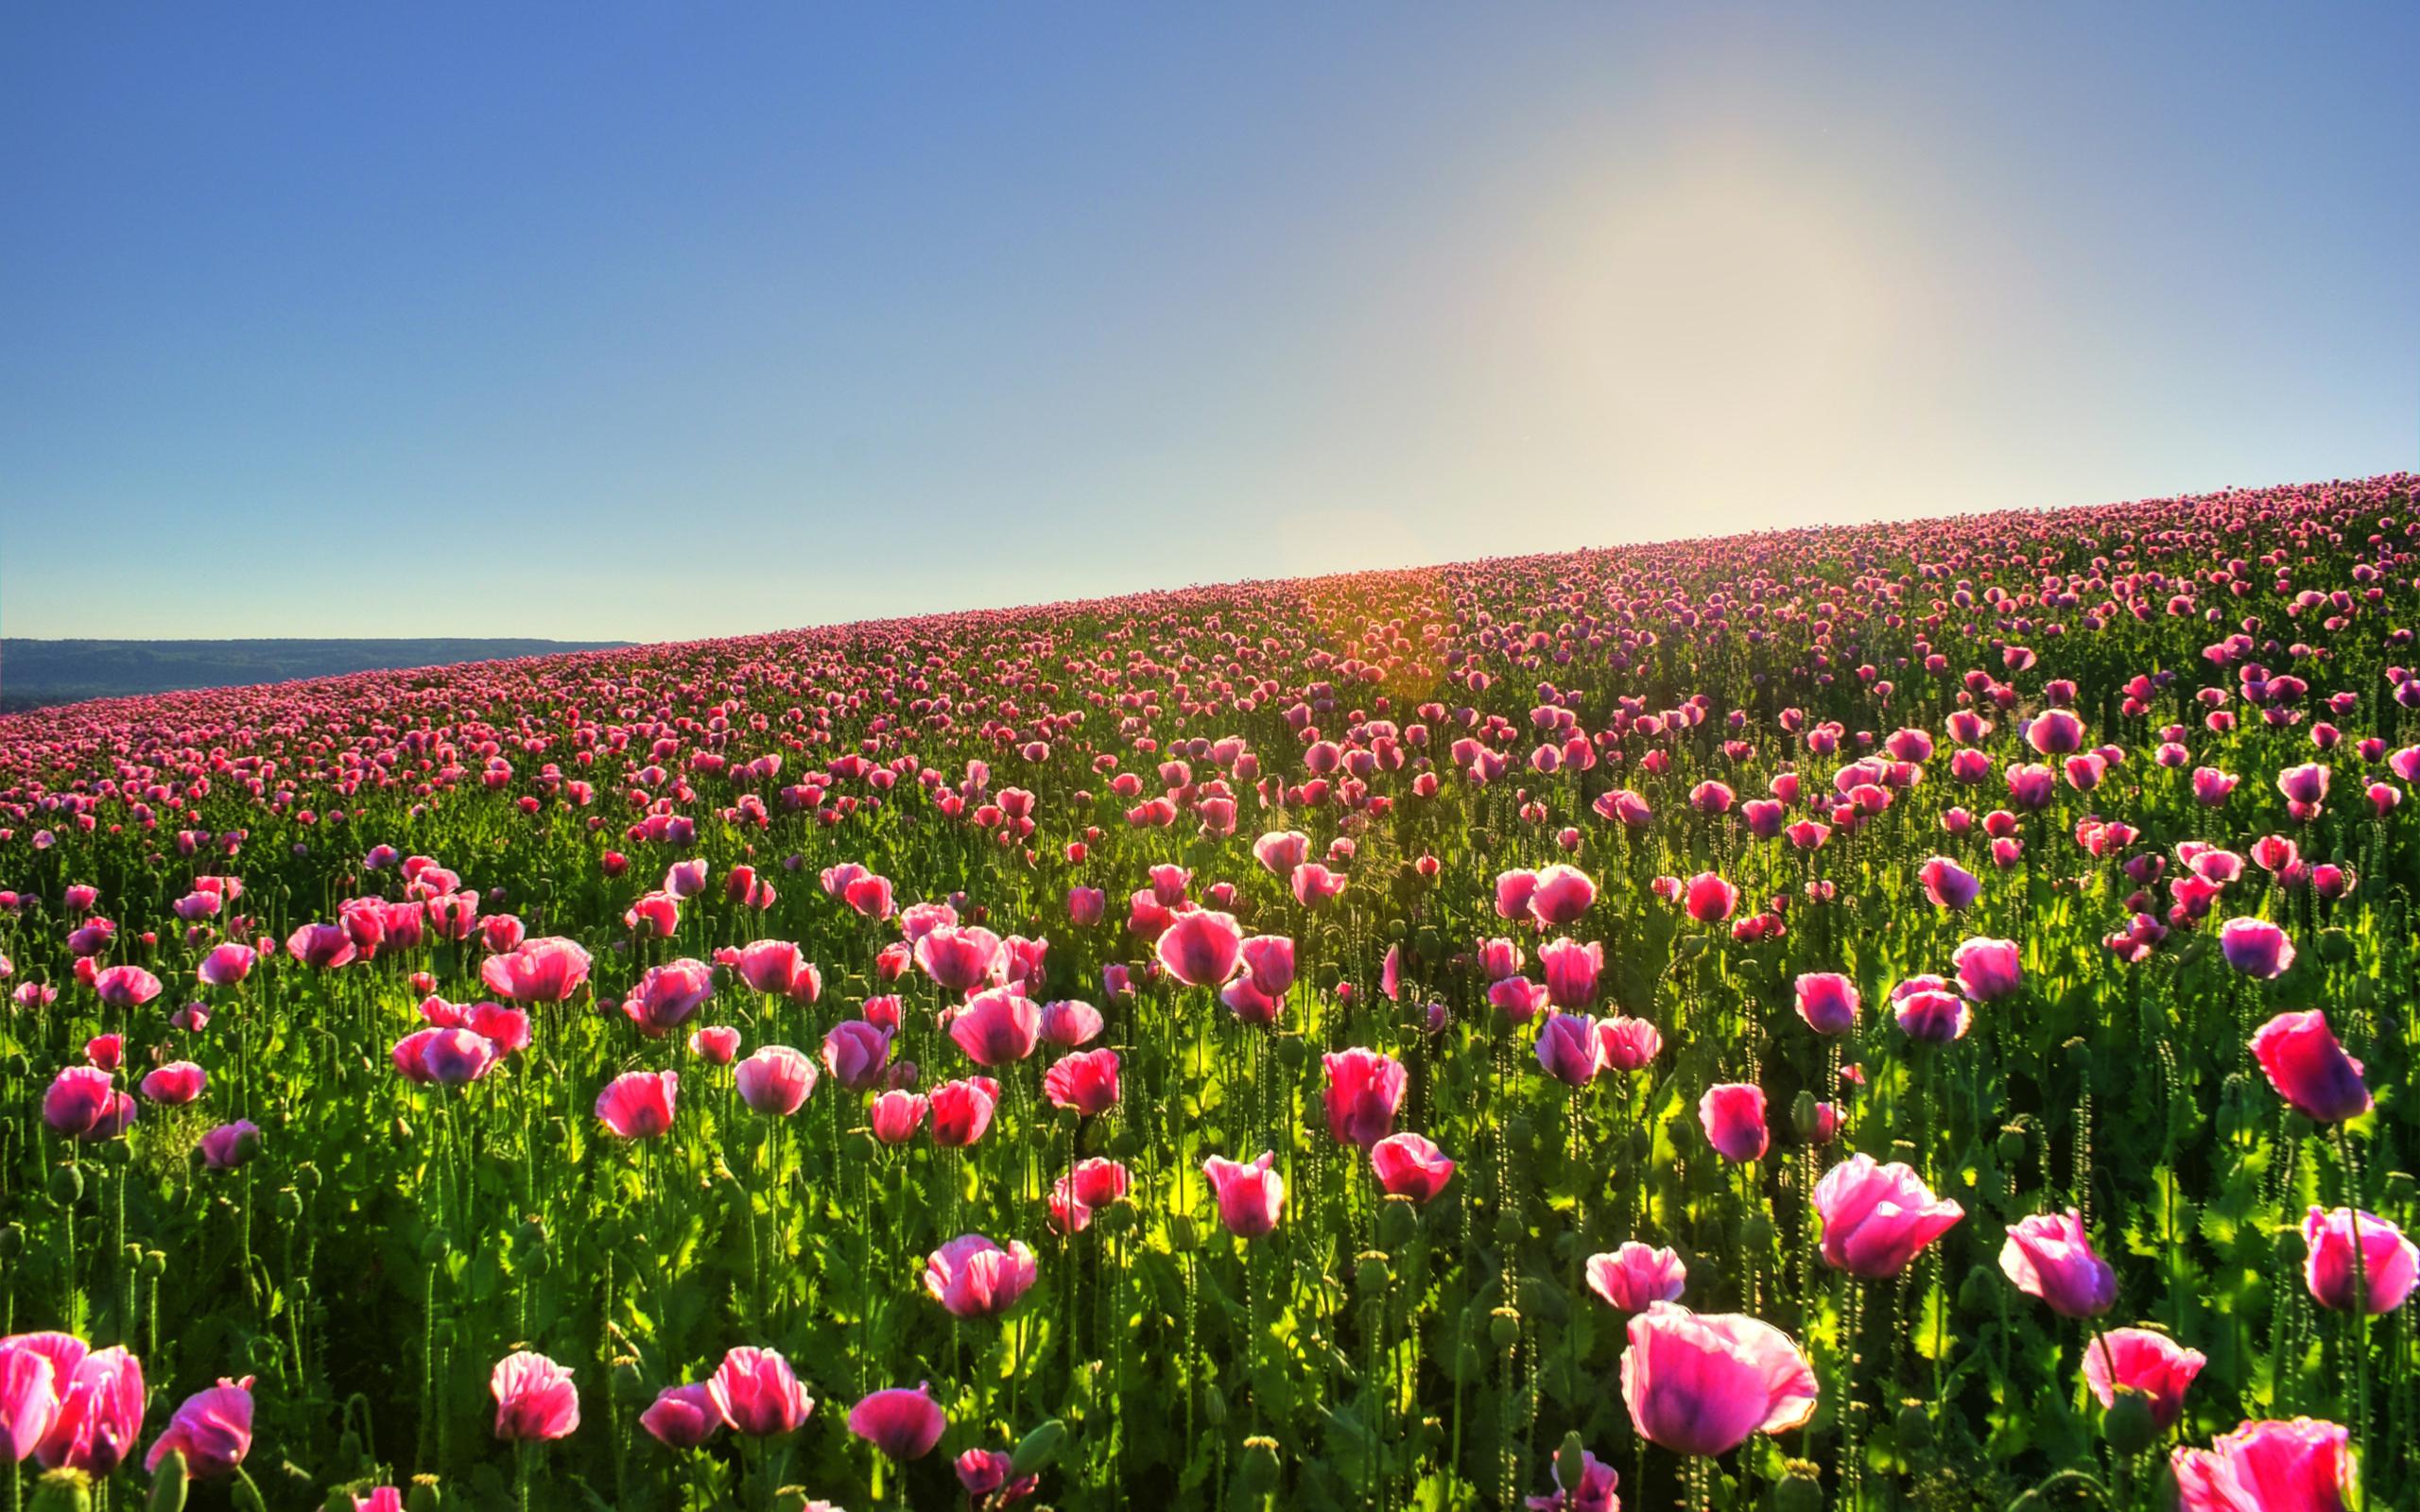 15 Wonderful HD Meadow Wallpapers